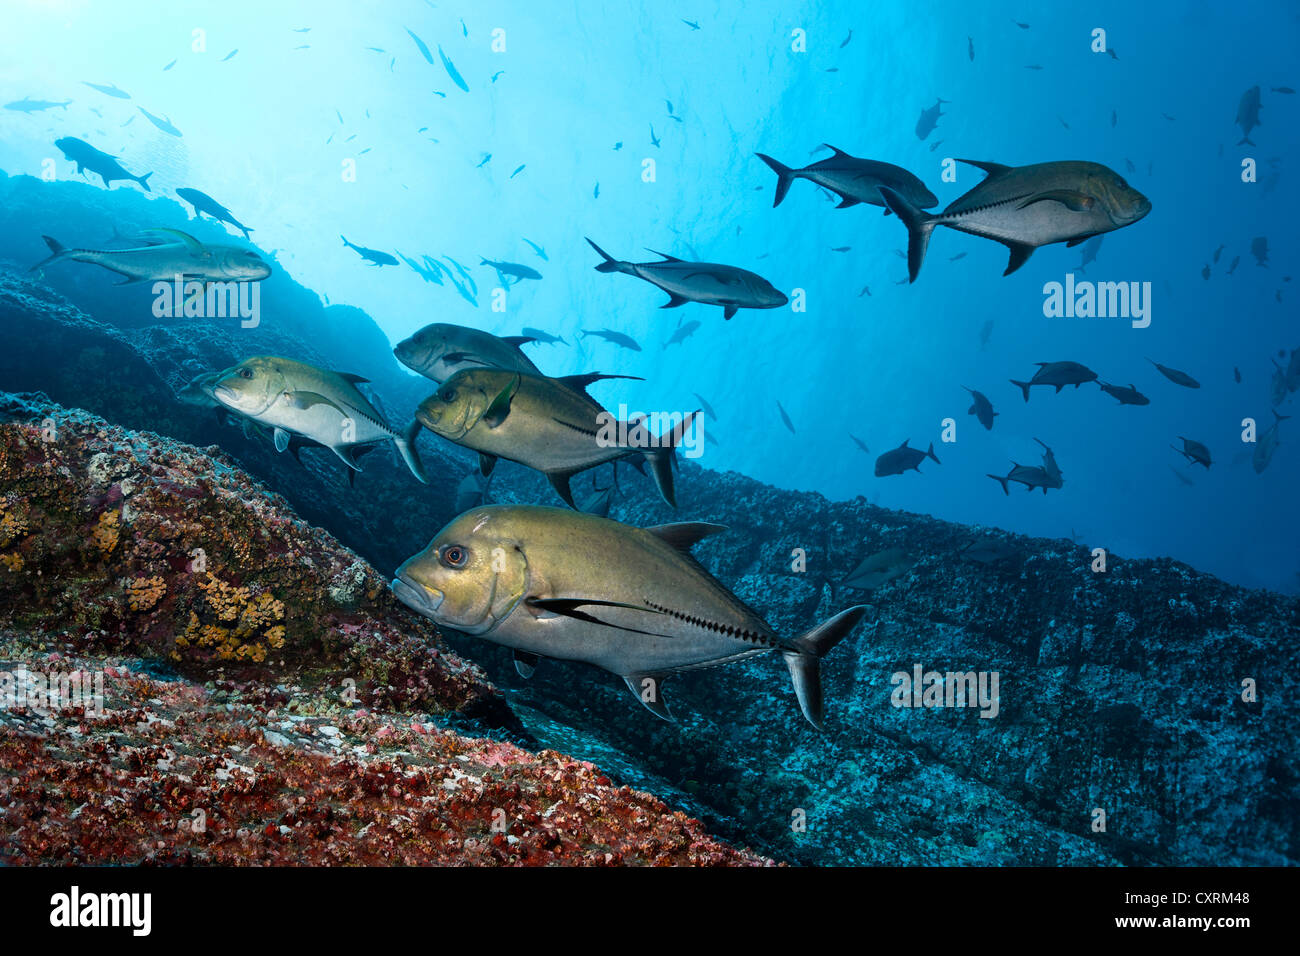 Shoal of Black Jacks or Black Trevallies (Caranx lugubris) hunting at a rocky reef, Roca Partida, Revillagigedo Islands, Mexico Stock Photo